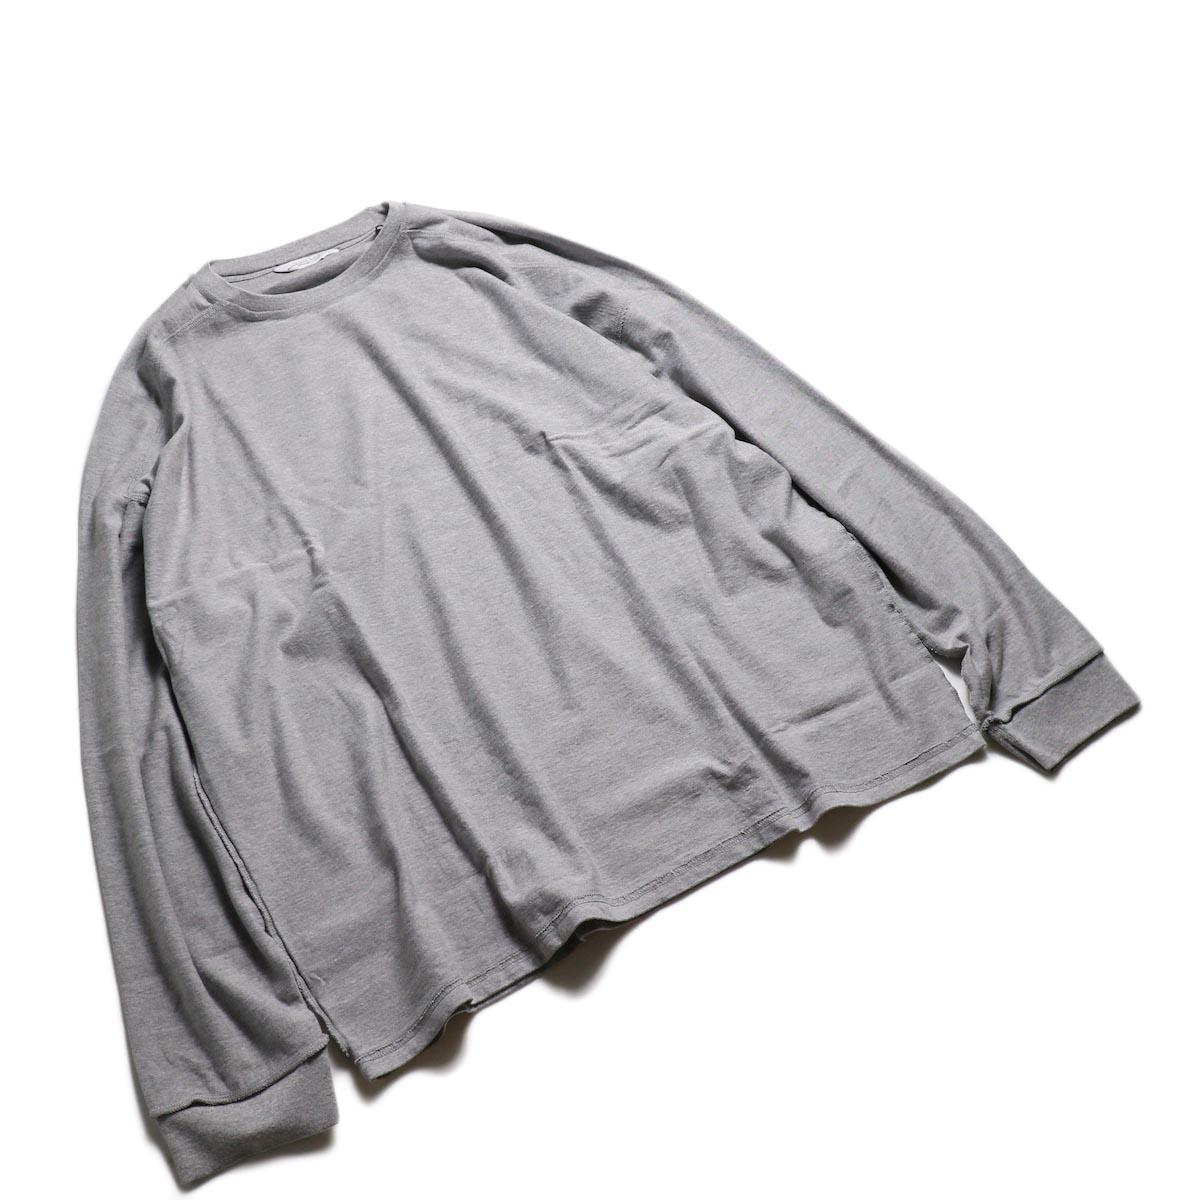 UNUSED / US1686 Long Sleeve T-Shirt -Heather Gray 全体